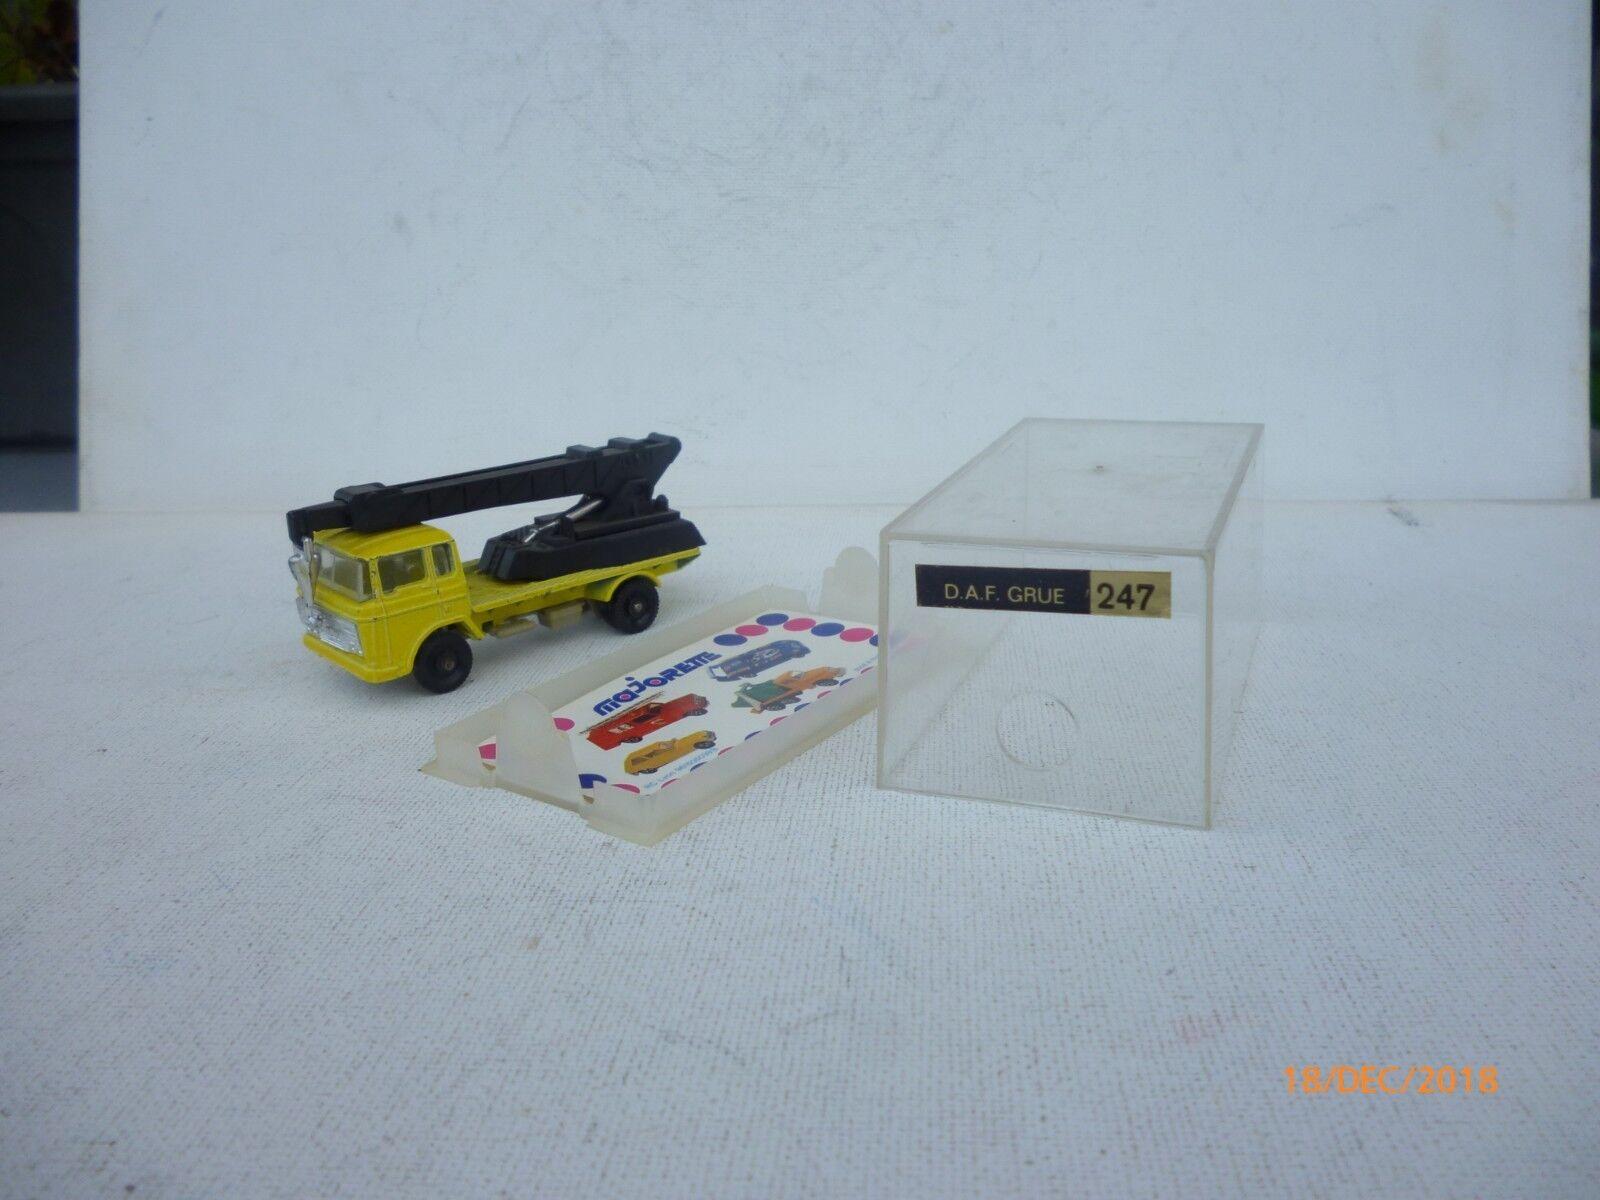 MAJORETTE     FRANCE   246 DAF GRUE 1 100  NEAR MINT IN BOX 78045e